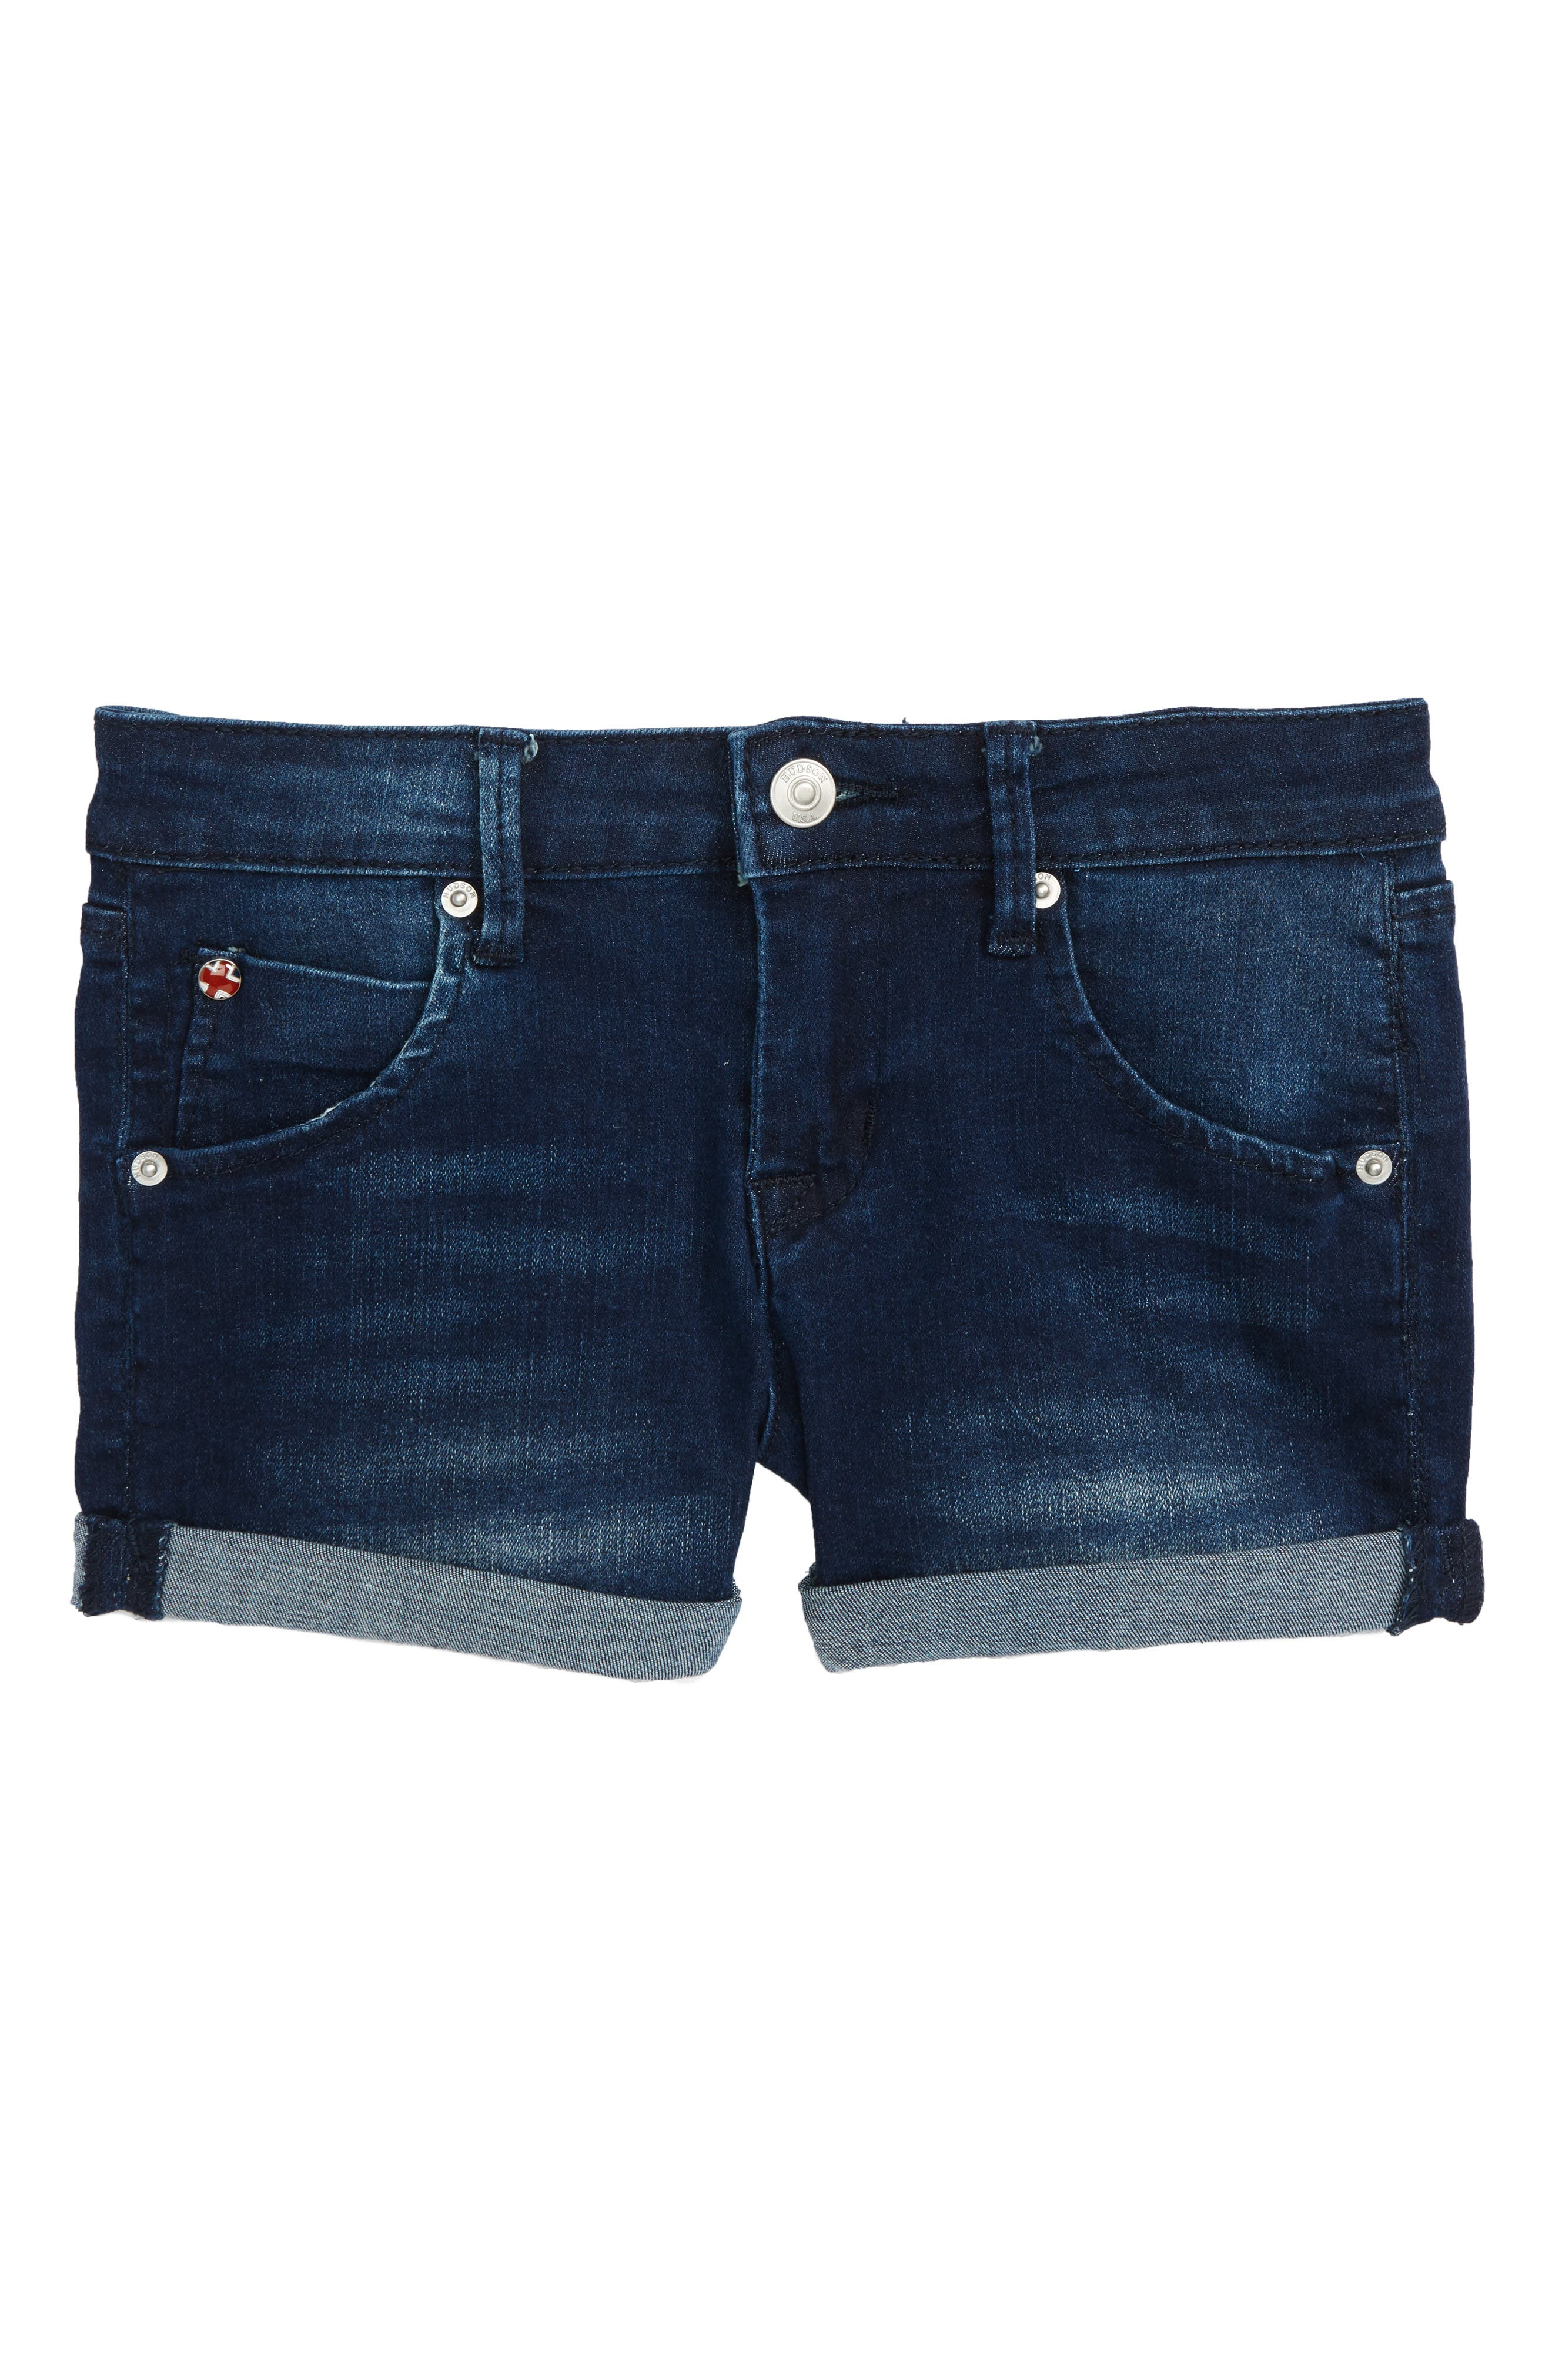 Roll Cuff Denim Shorts,                         Main,                         color, Low Octane